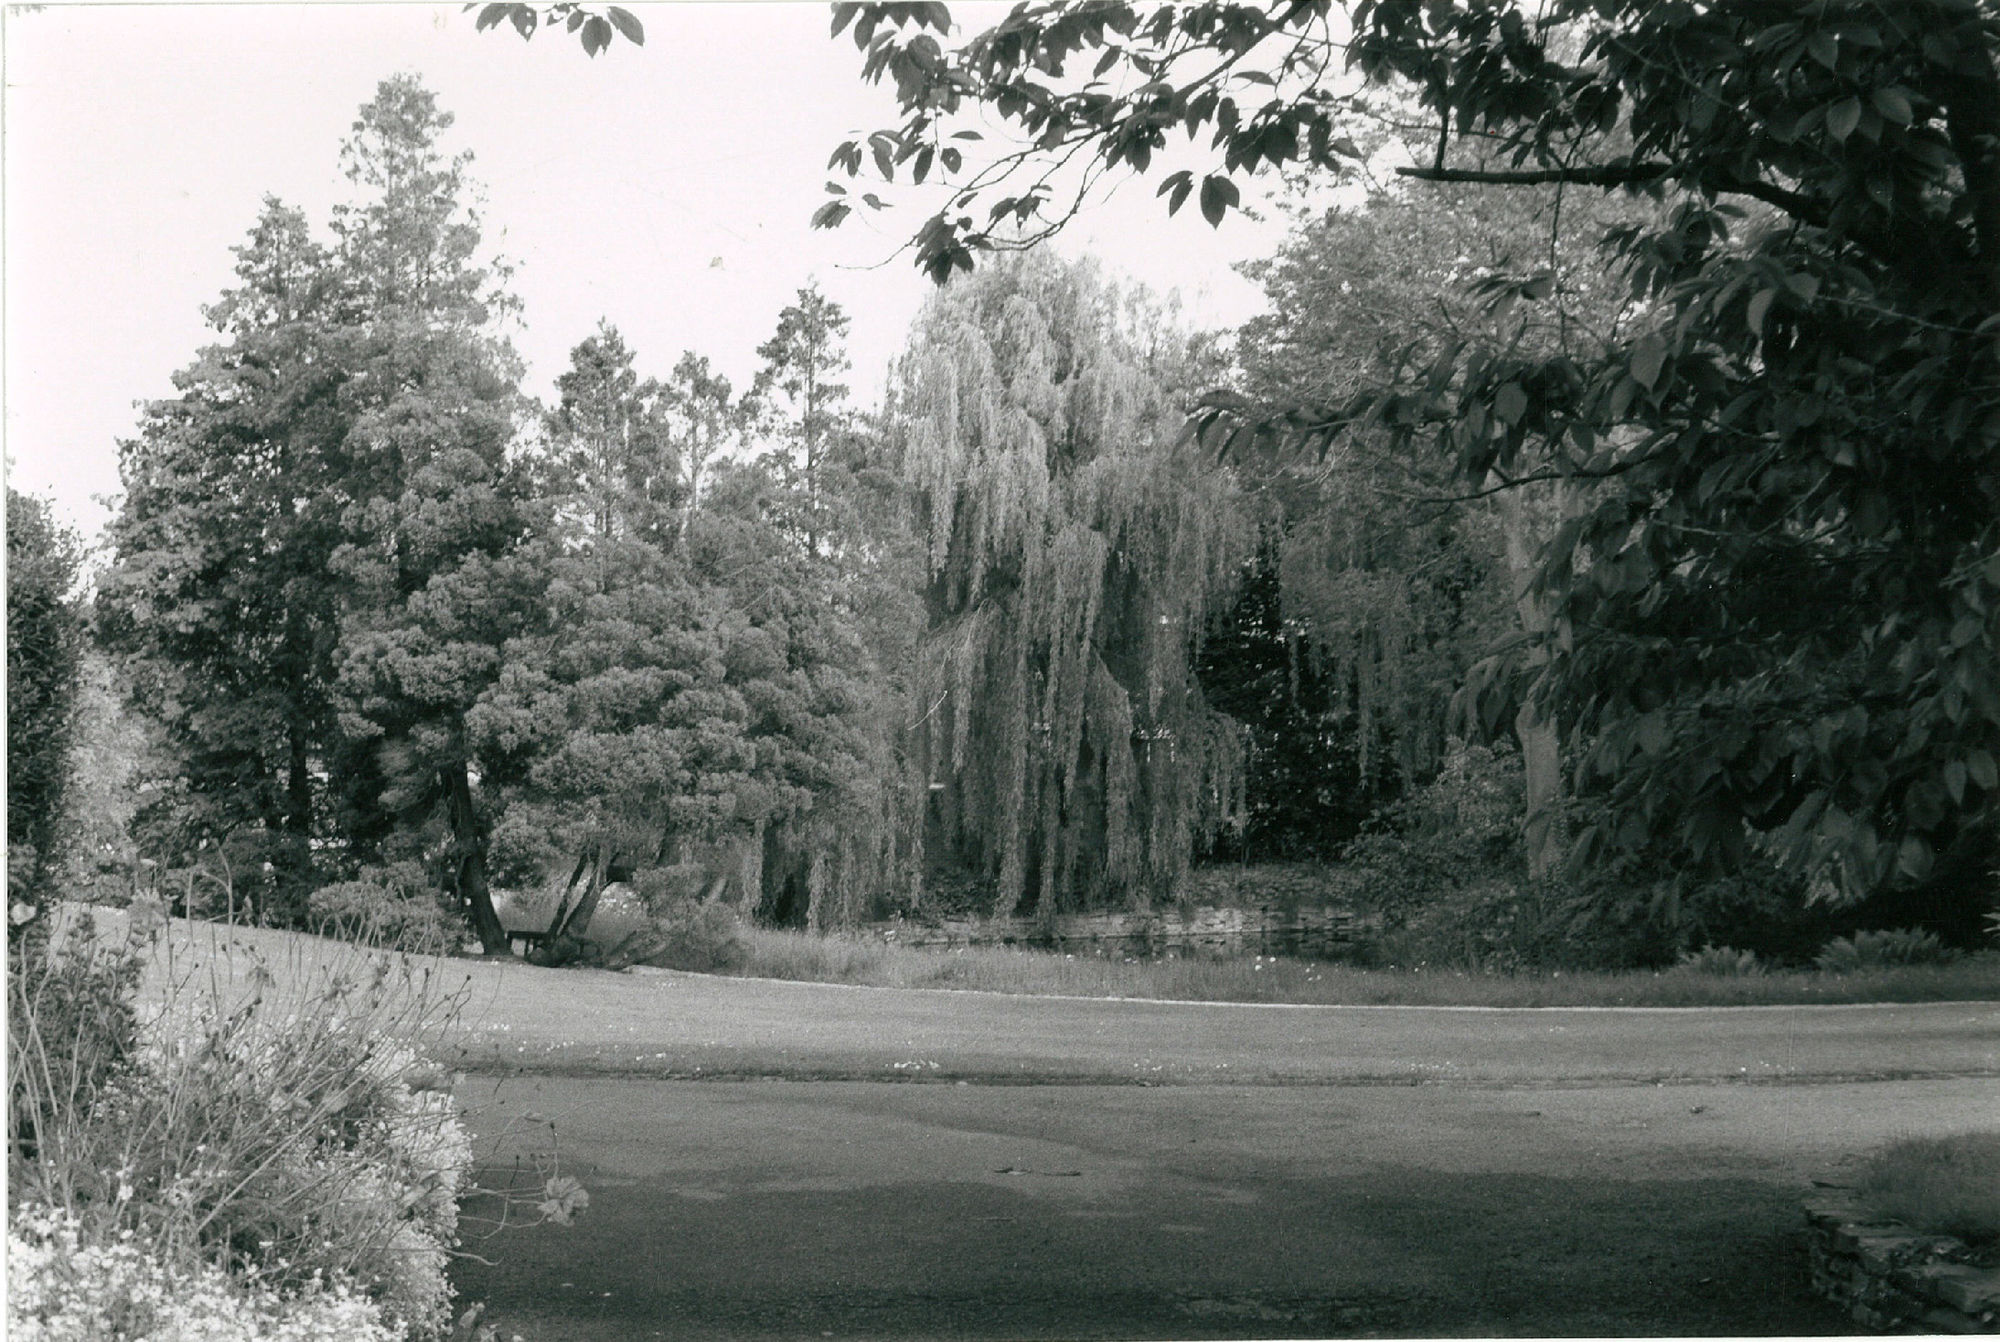 Tuin aan de Pottelberg